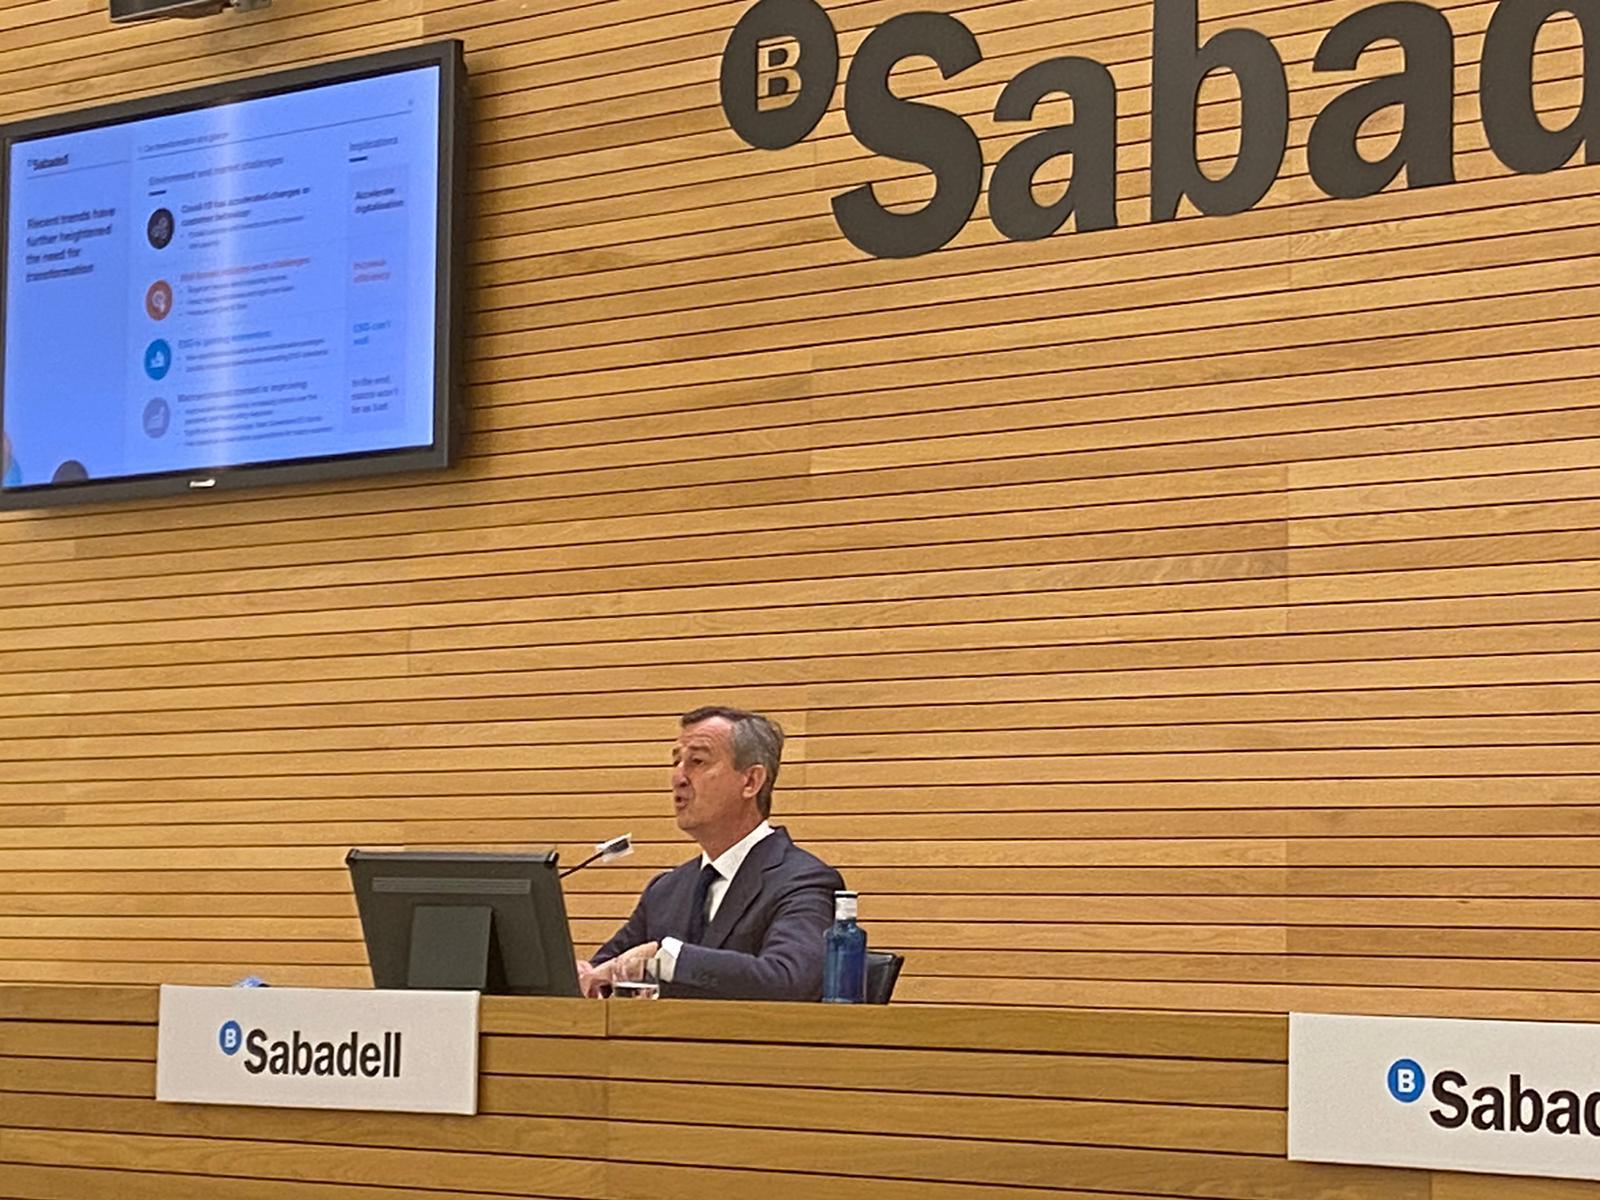 banco sabadell aspira a un beneficio de 800 millones en